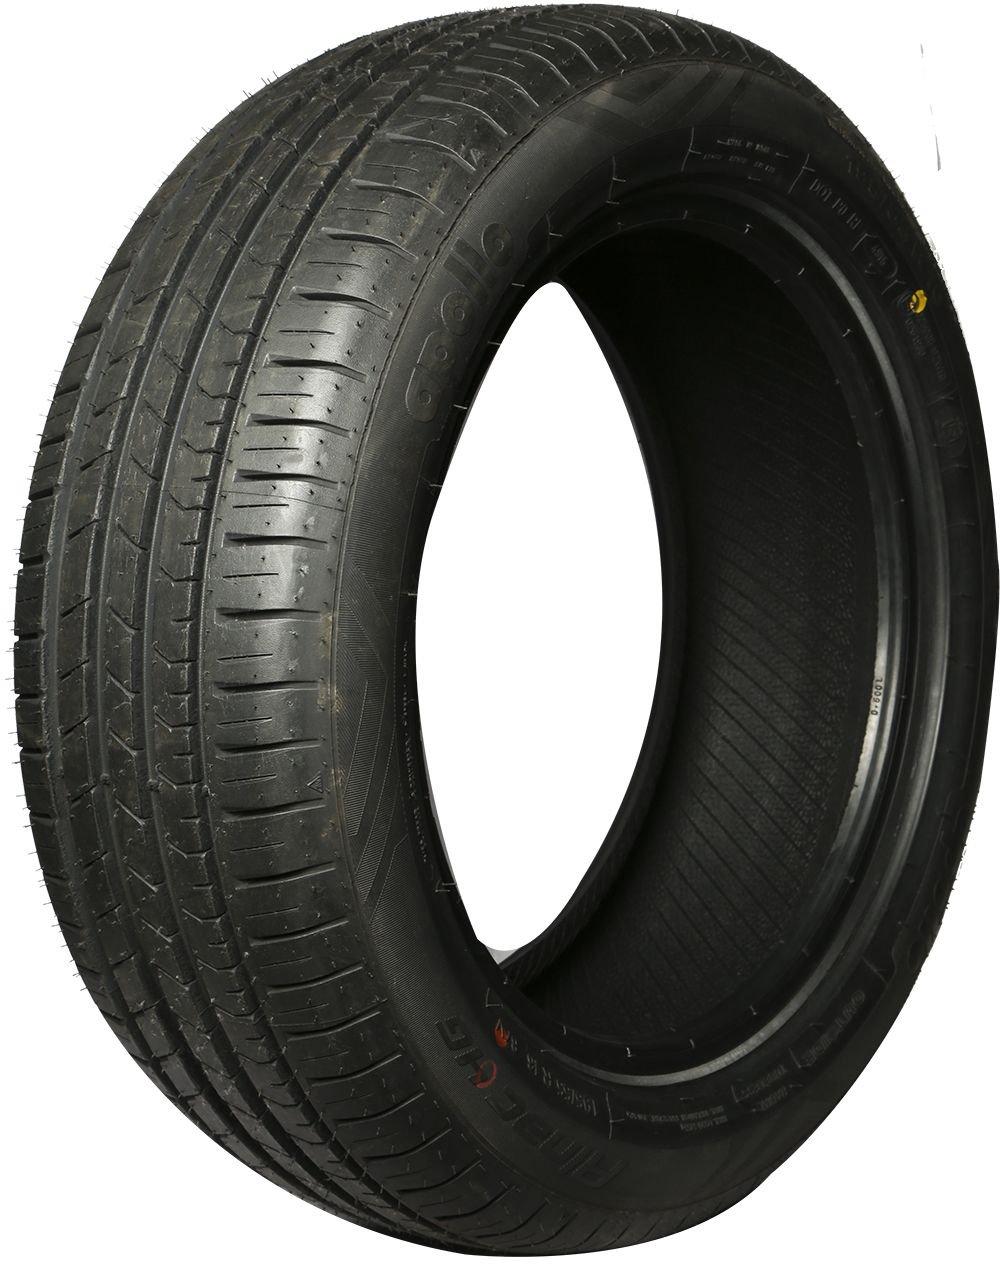 Apollo Alnac 4g 195 55 R16 87h Tubeless Car Tyre Amazon In Car Motorbike